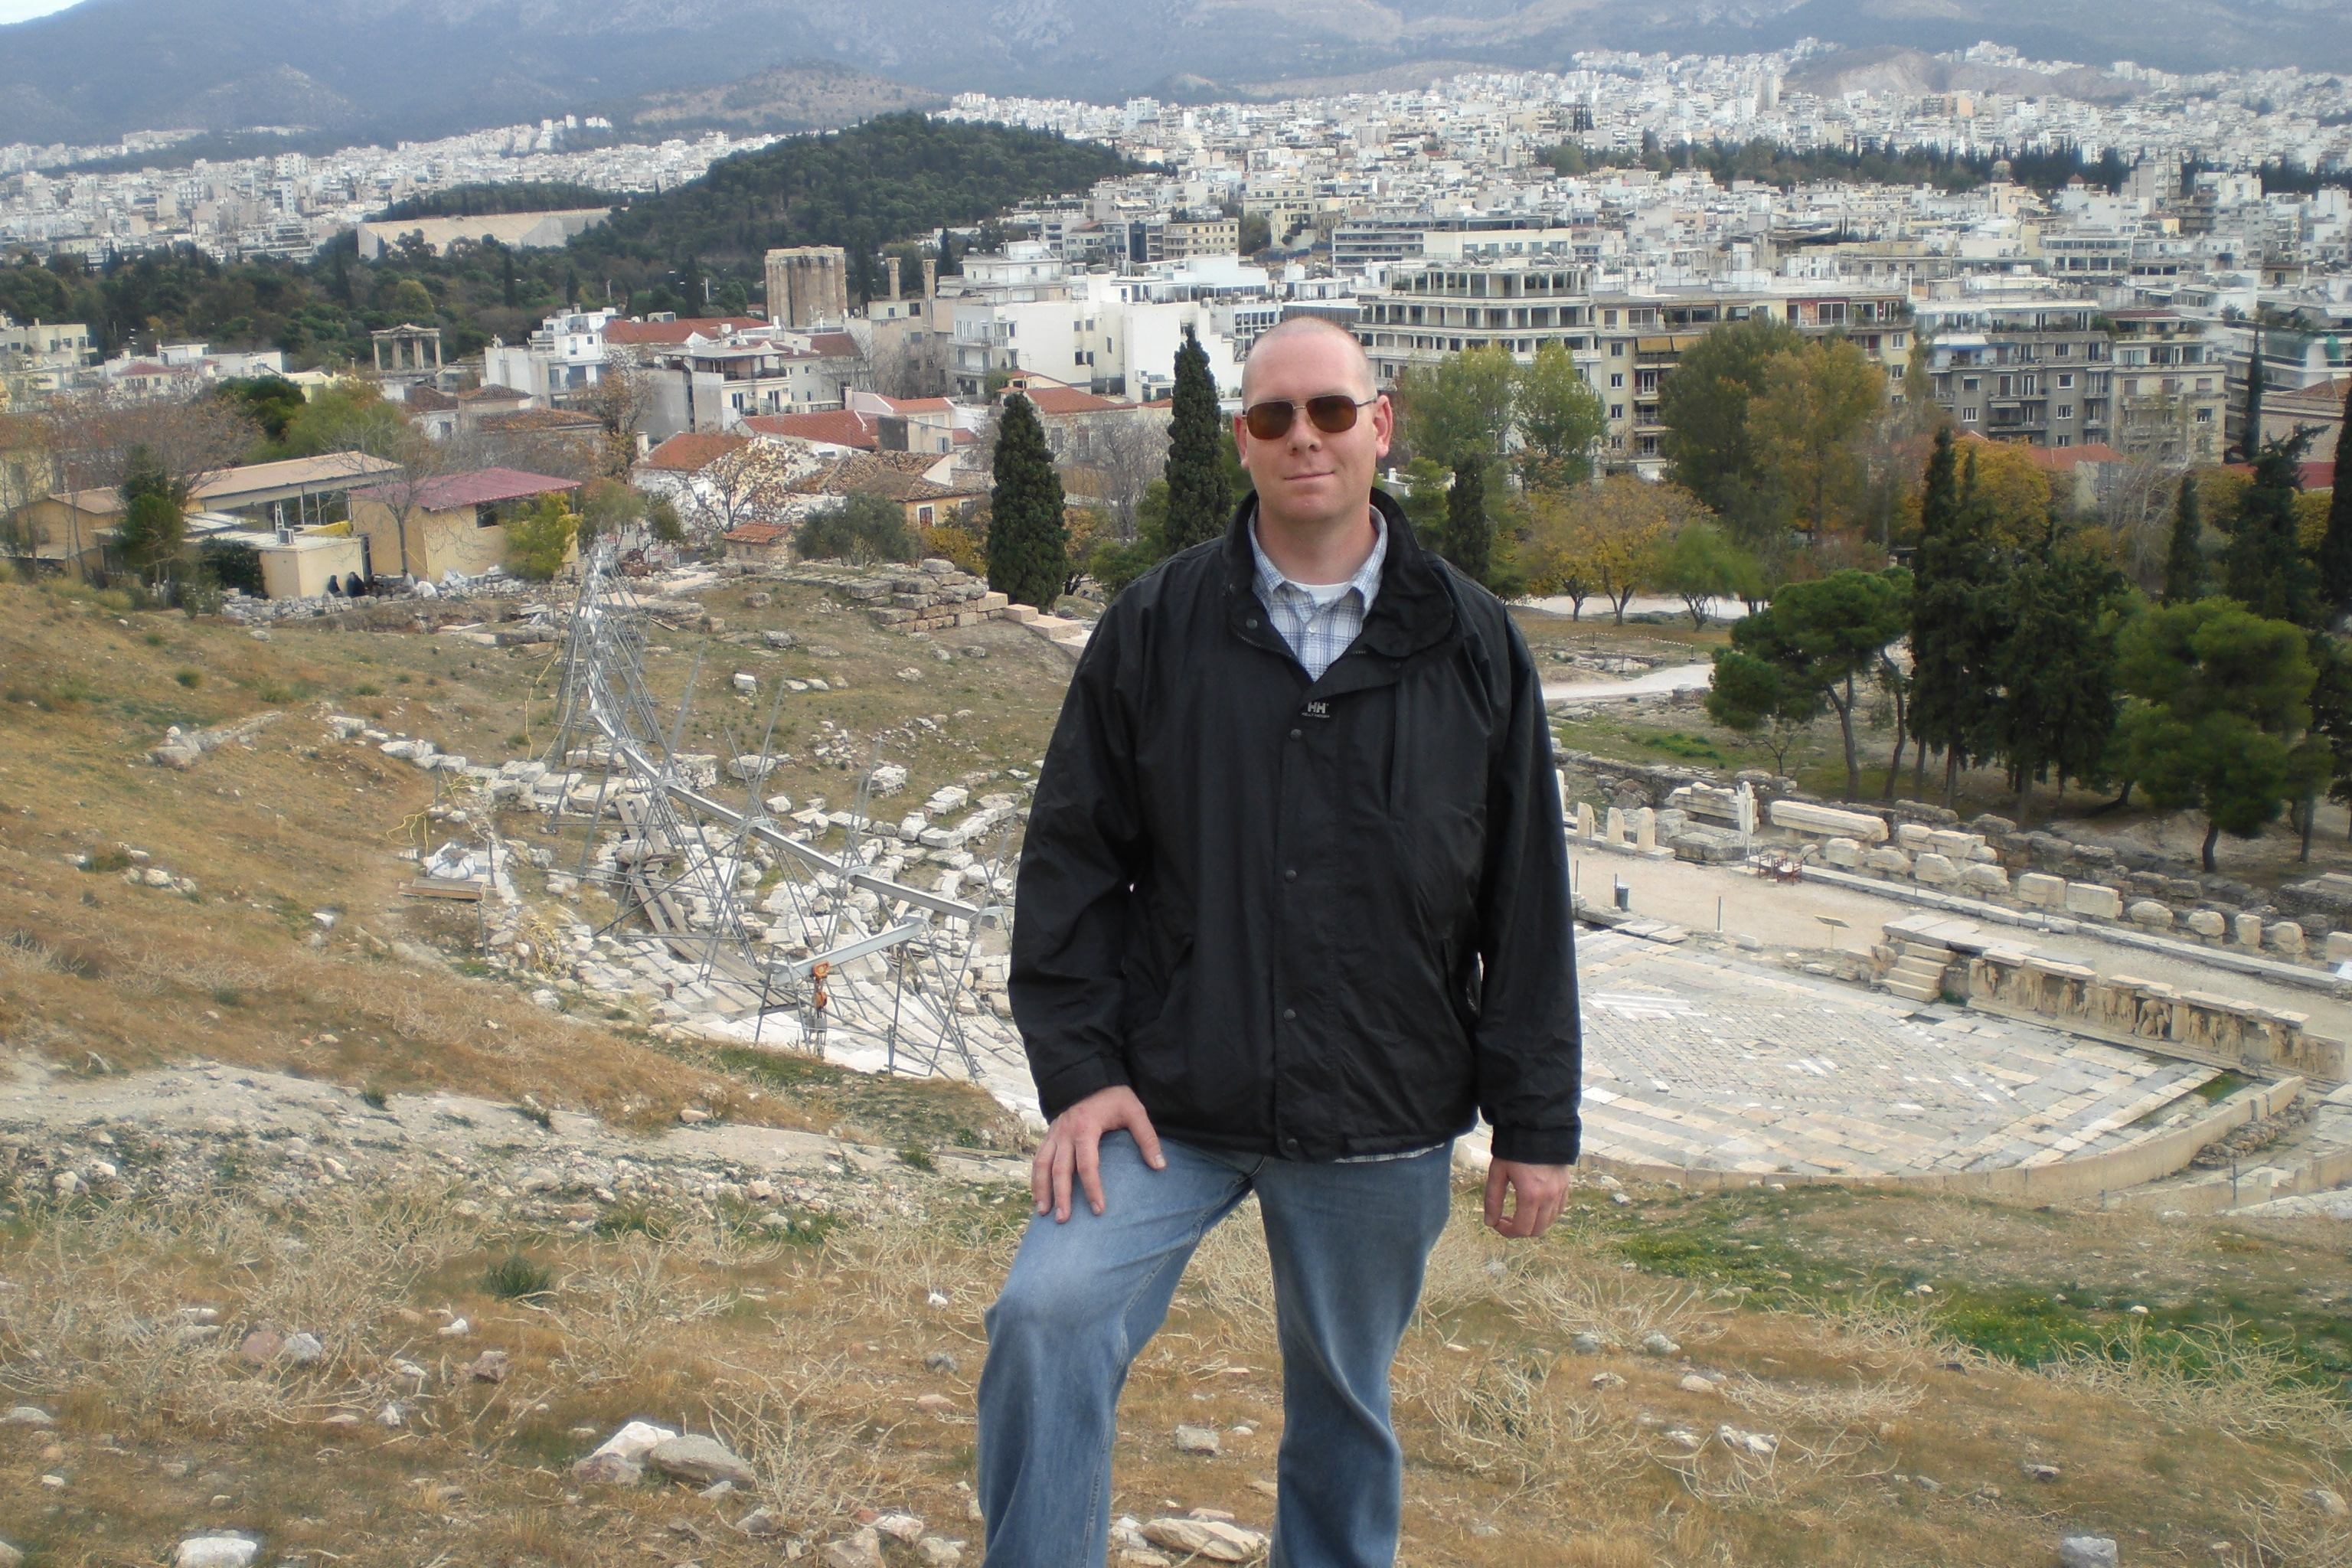 Athens, Dionysus theater